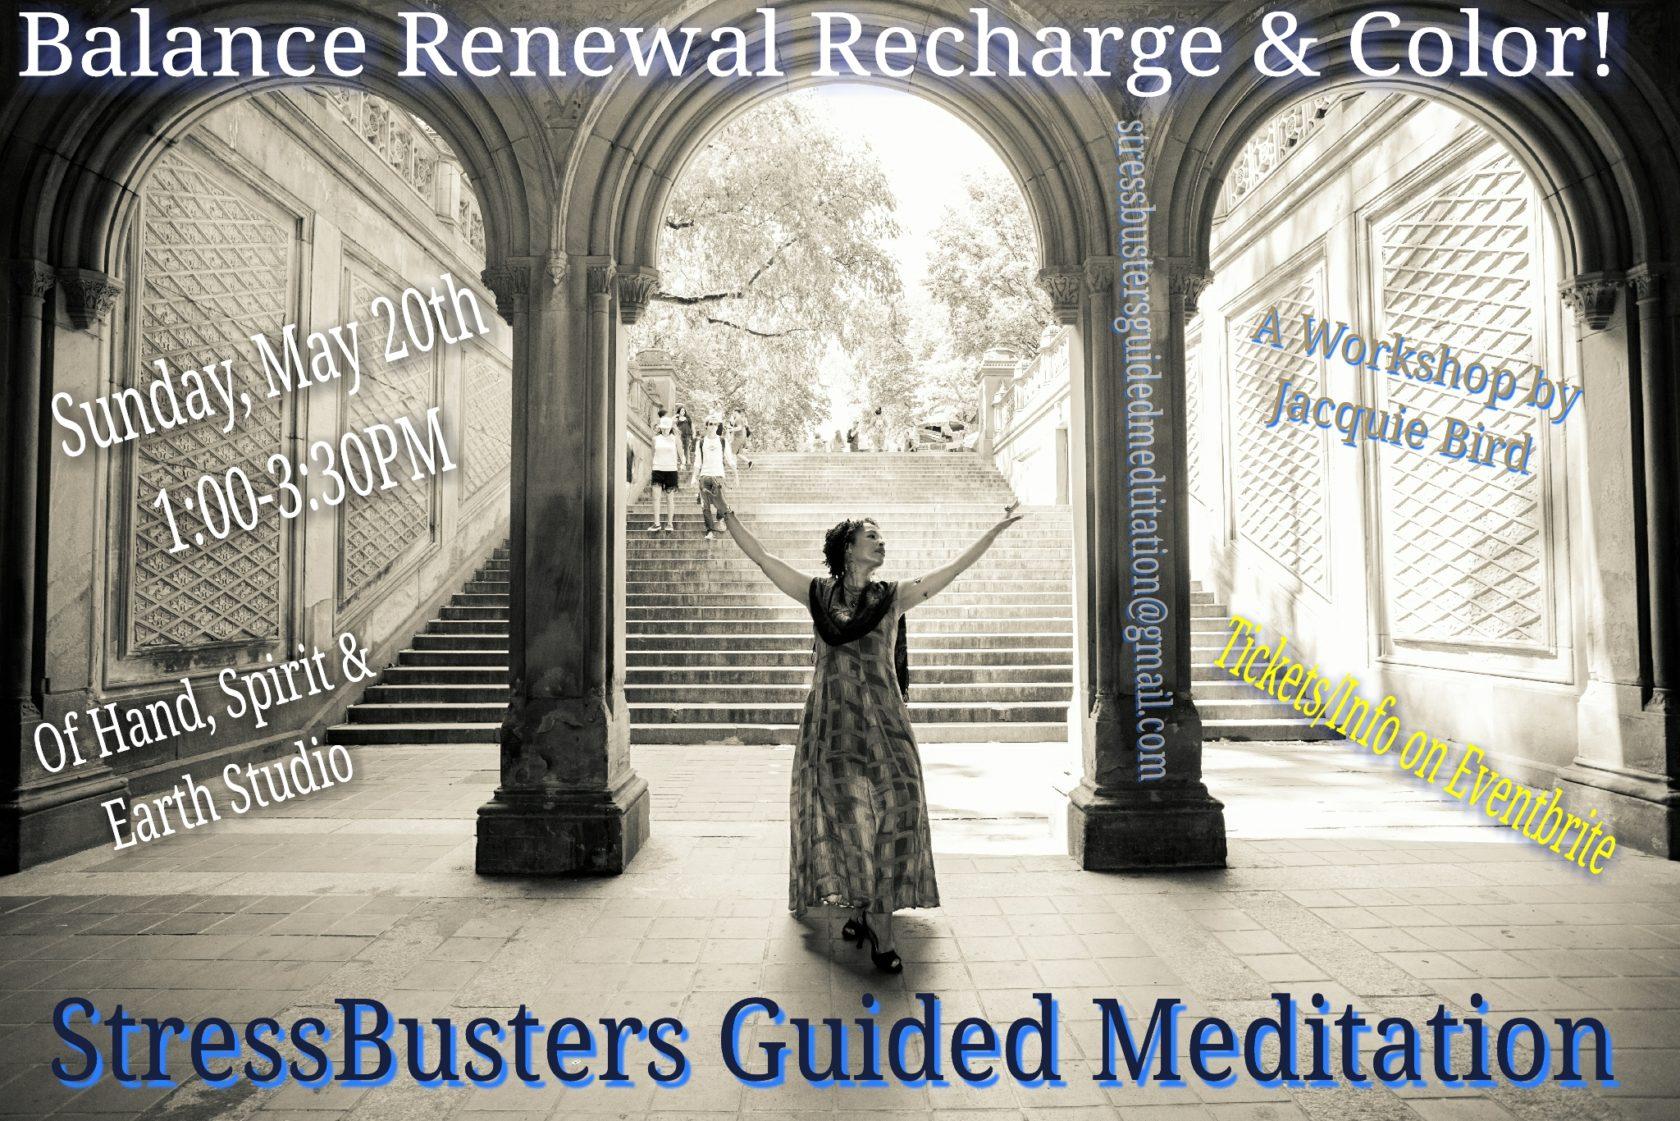 Balance Renewal Recharge & COLOR! A Workshop